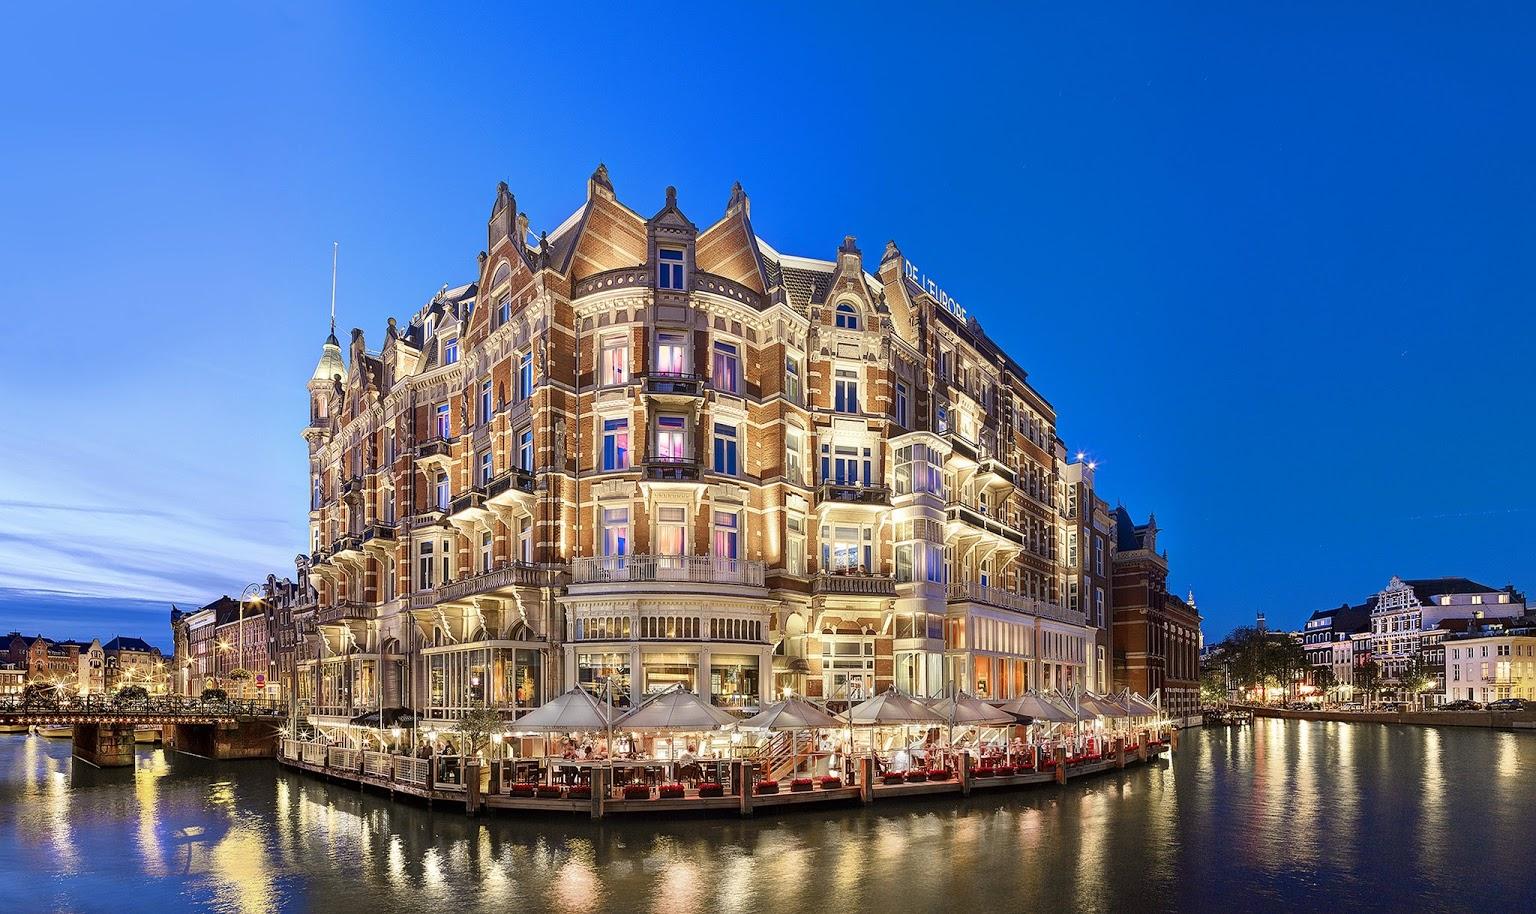 De L'Europe - Amsterdam